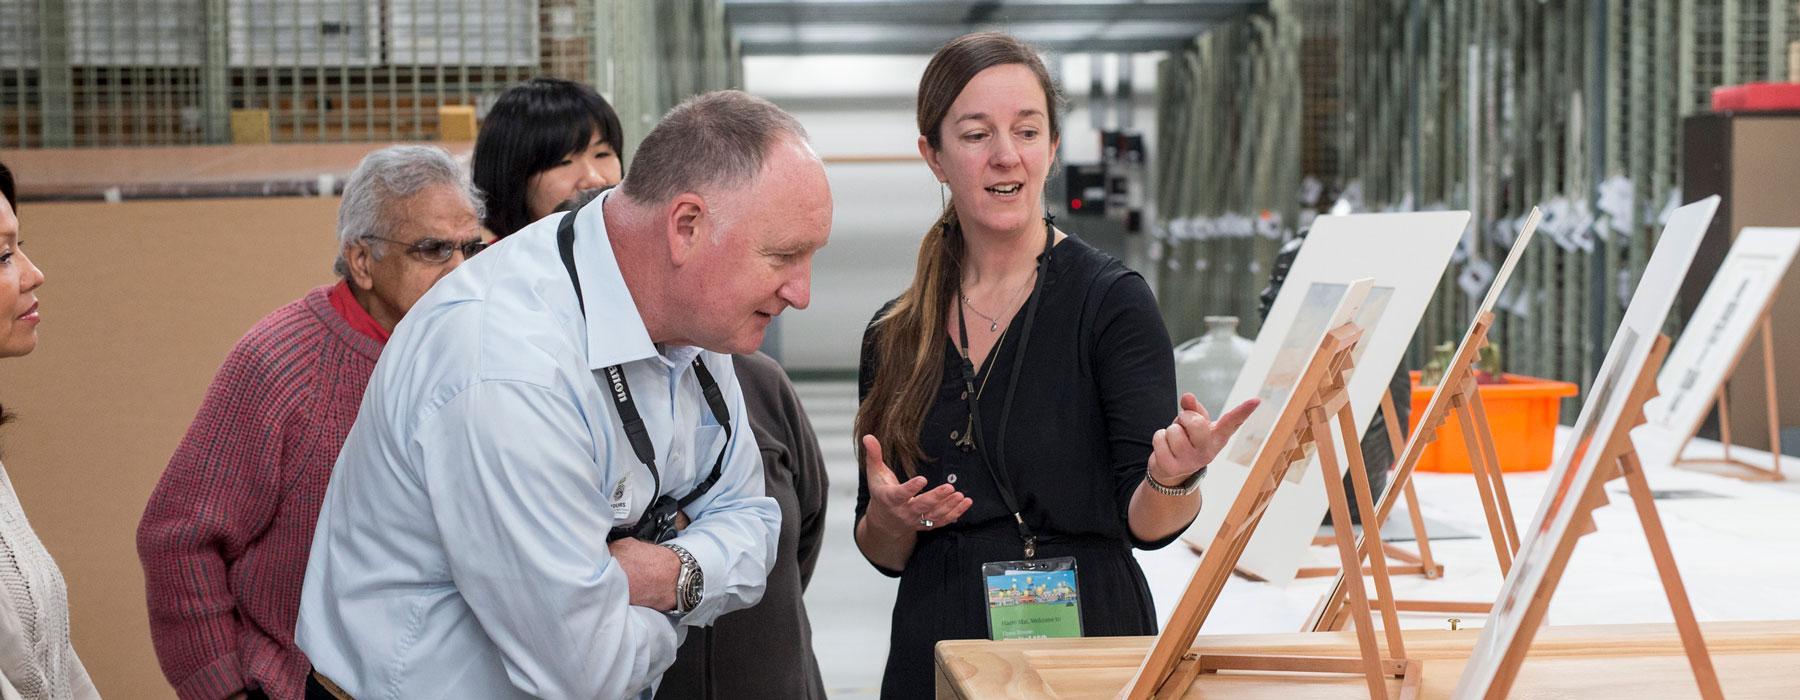 Curator showing visitors artwork